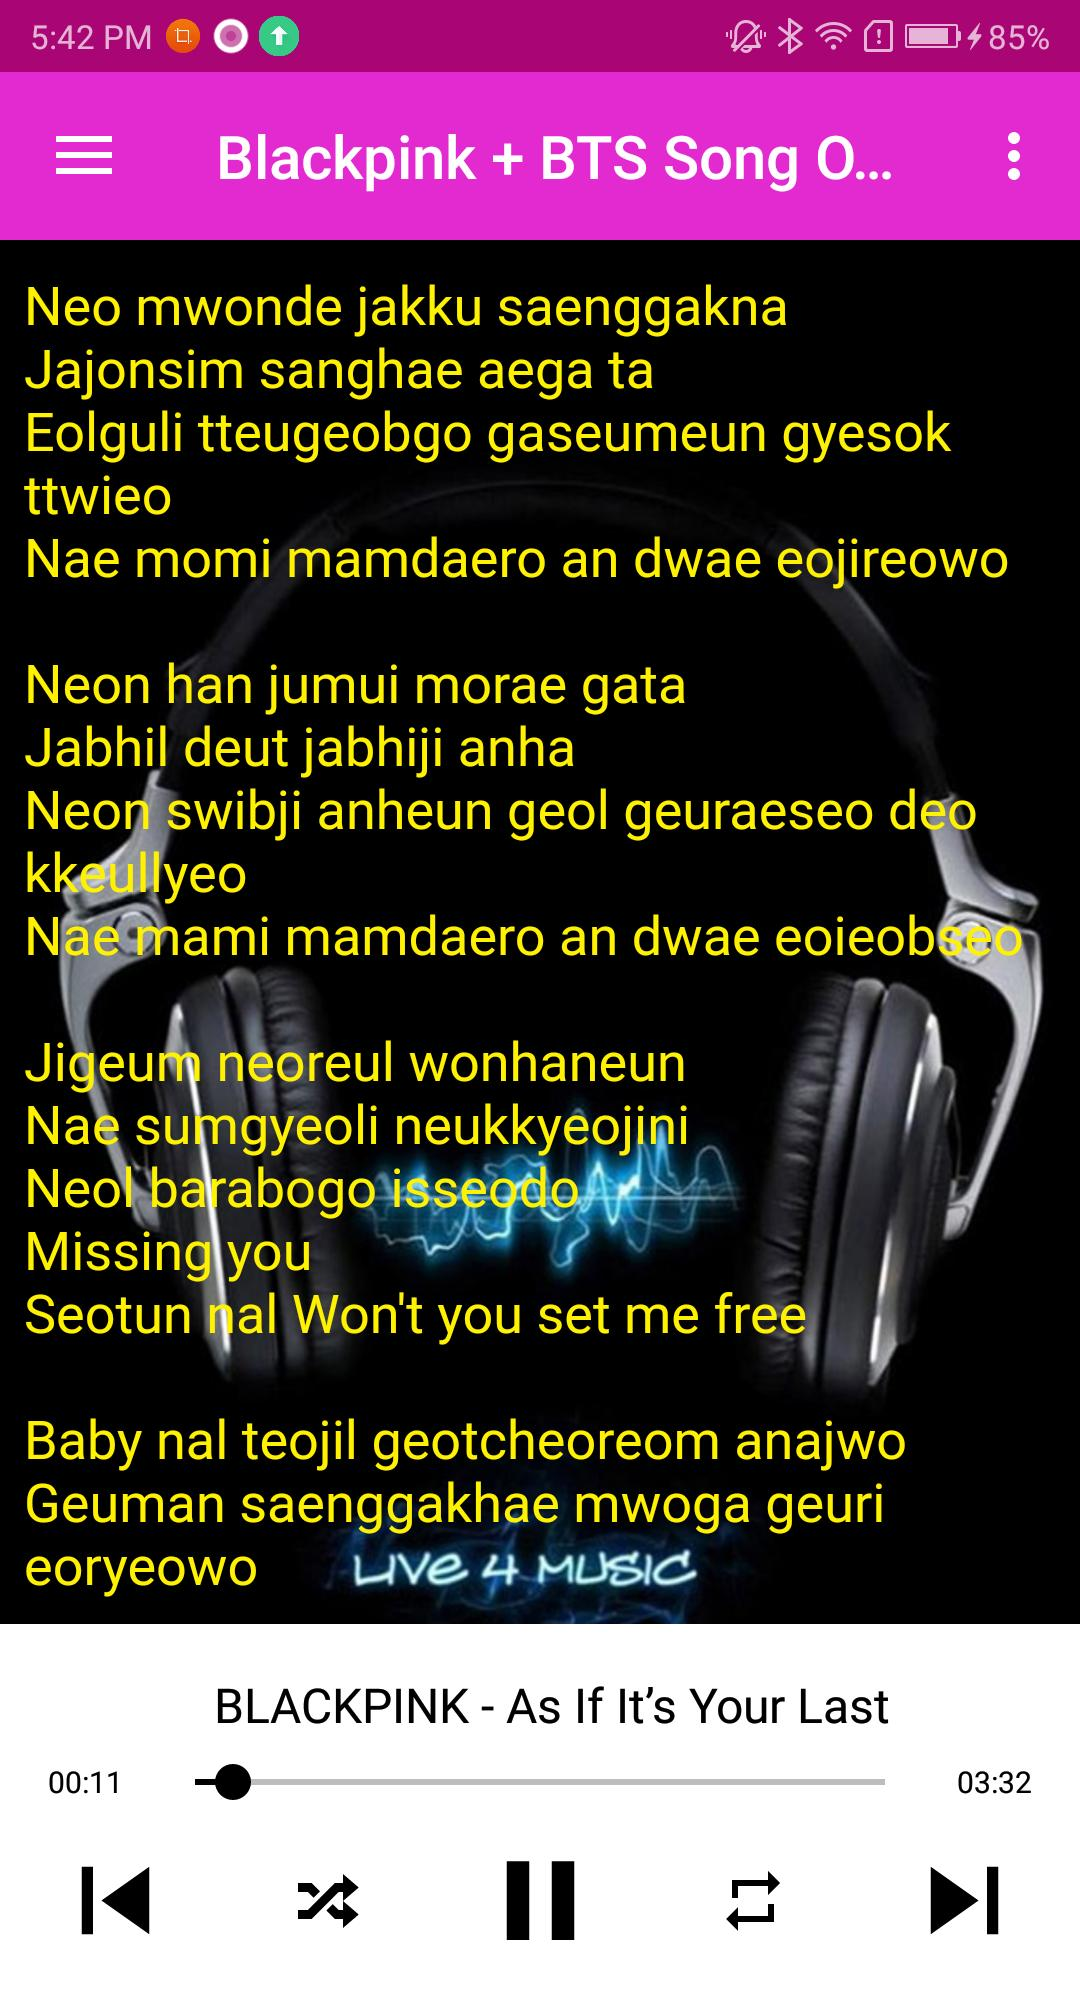 KPop Blackpink BTS Bingtanboys Song for Android - APK Download